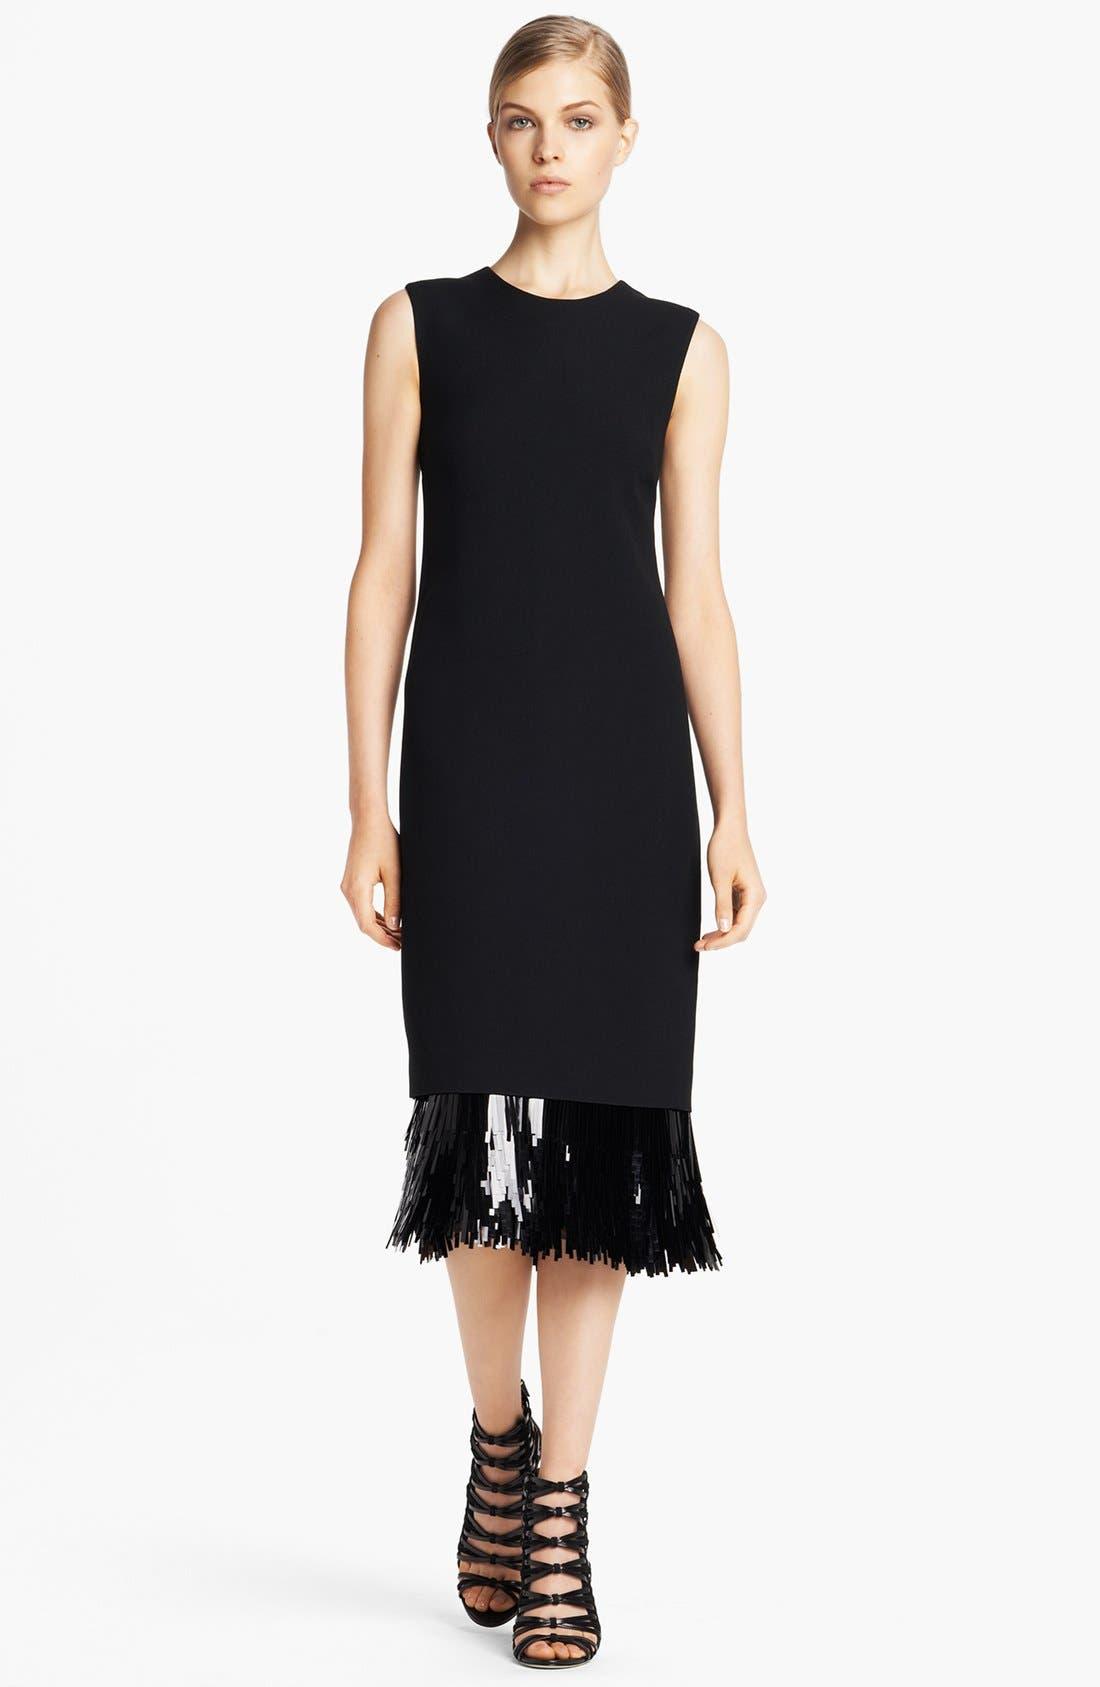 Alternate Image 1 Selected - Jason Wu Fringe Cut Sequin Sheath Dress